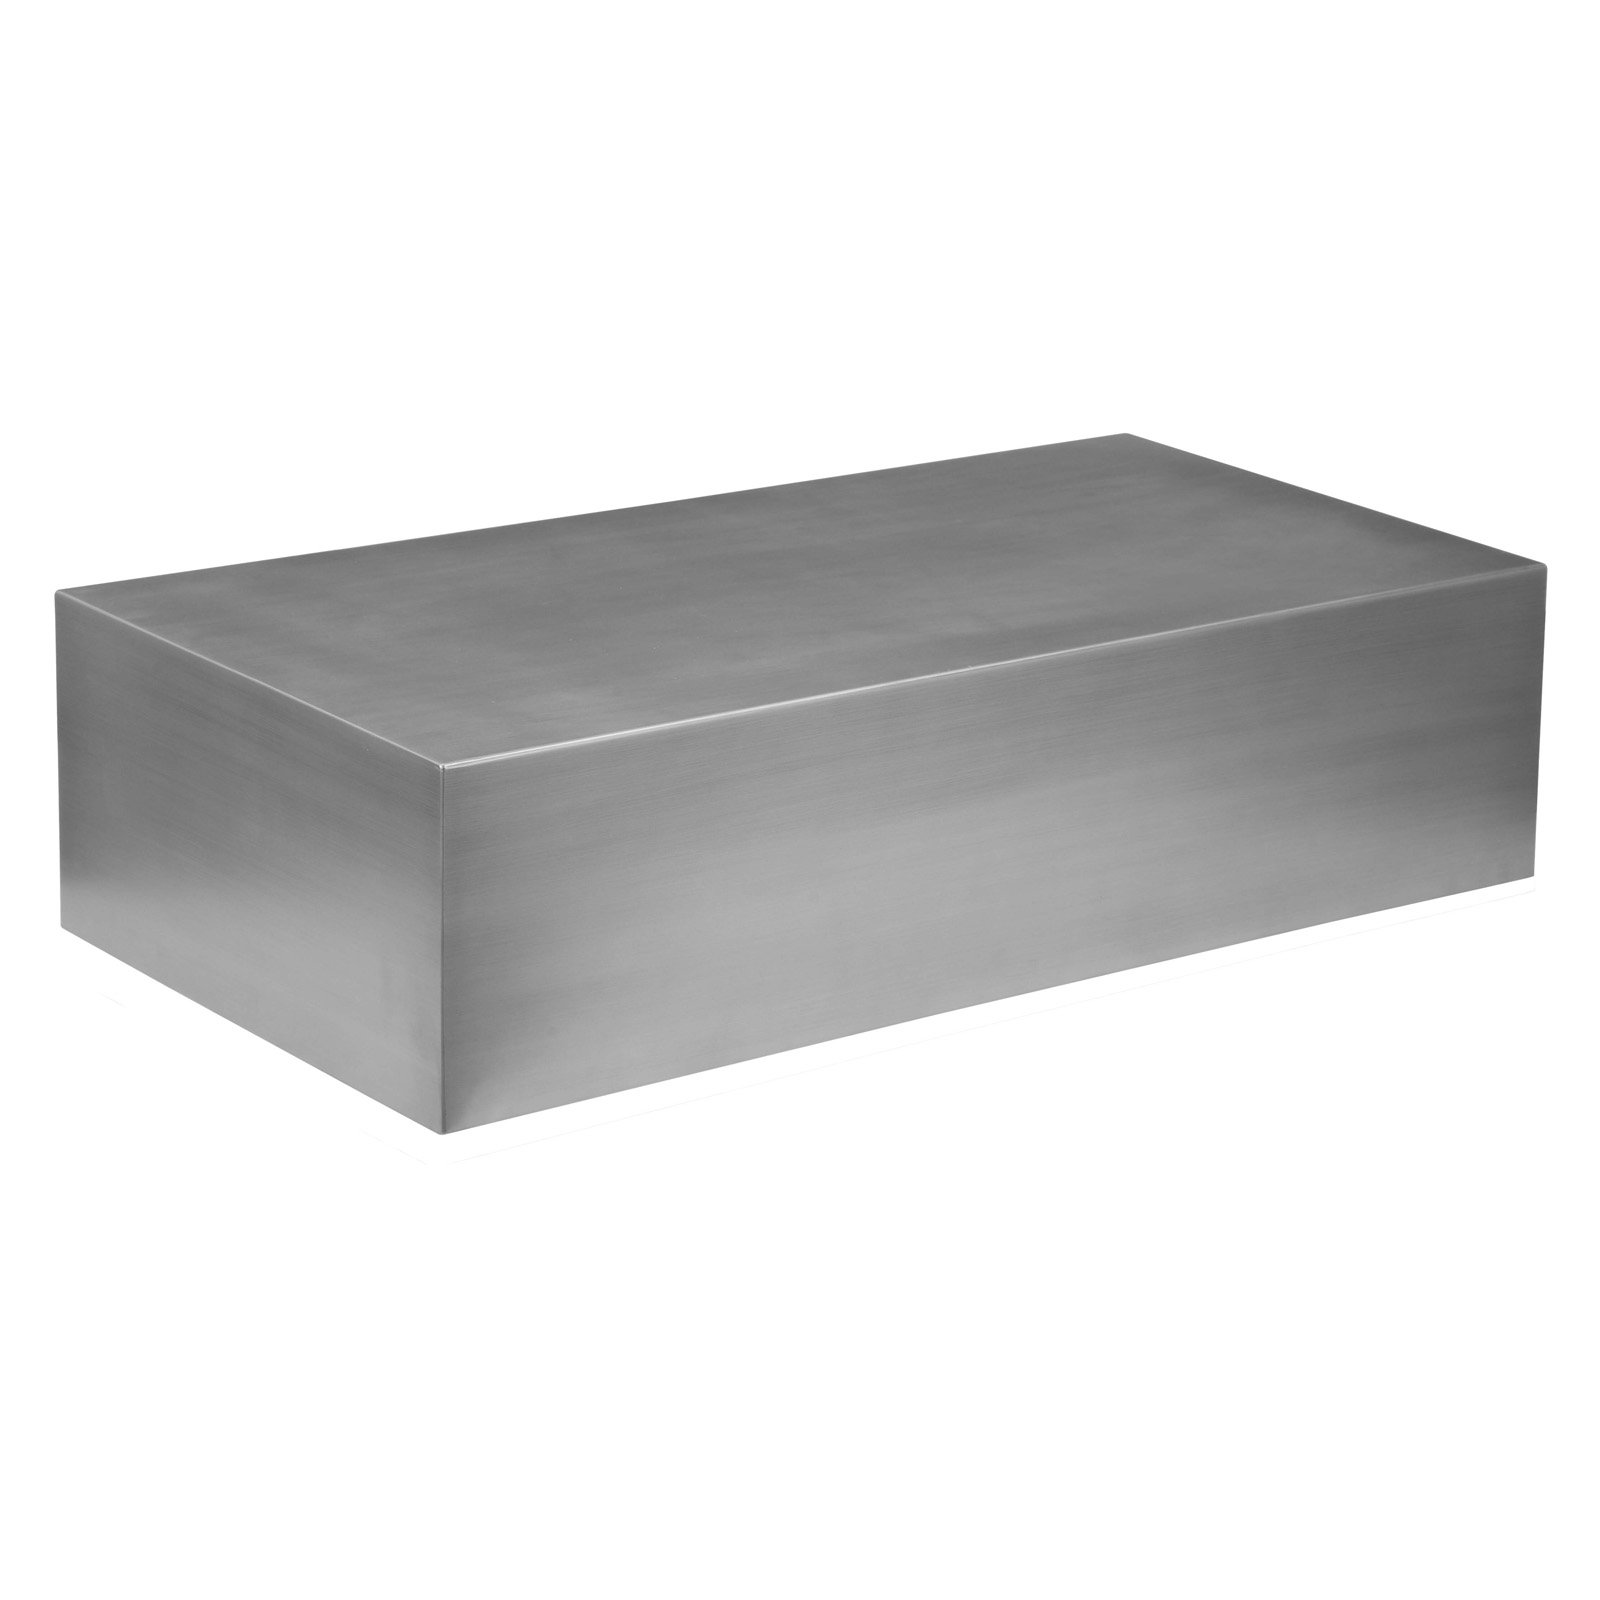 pangea home lanser brushed metal coffee table walmart com